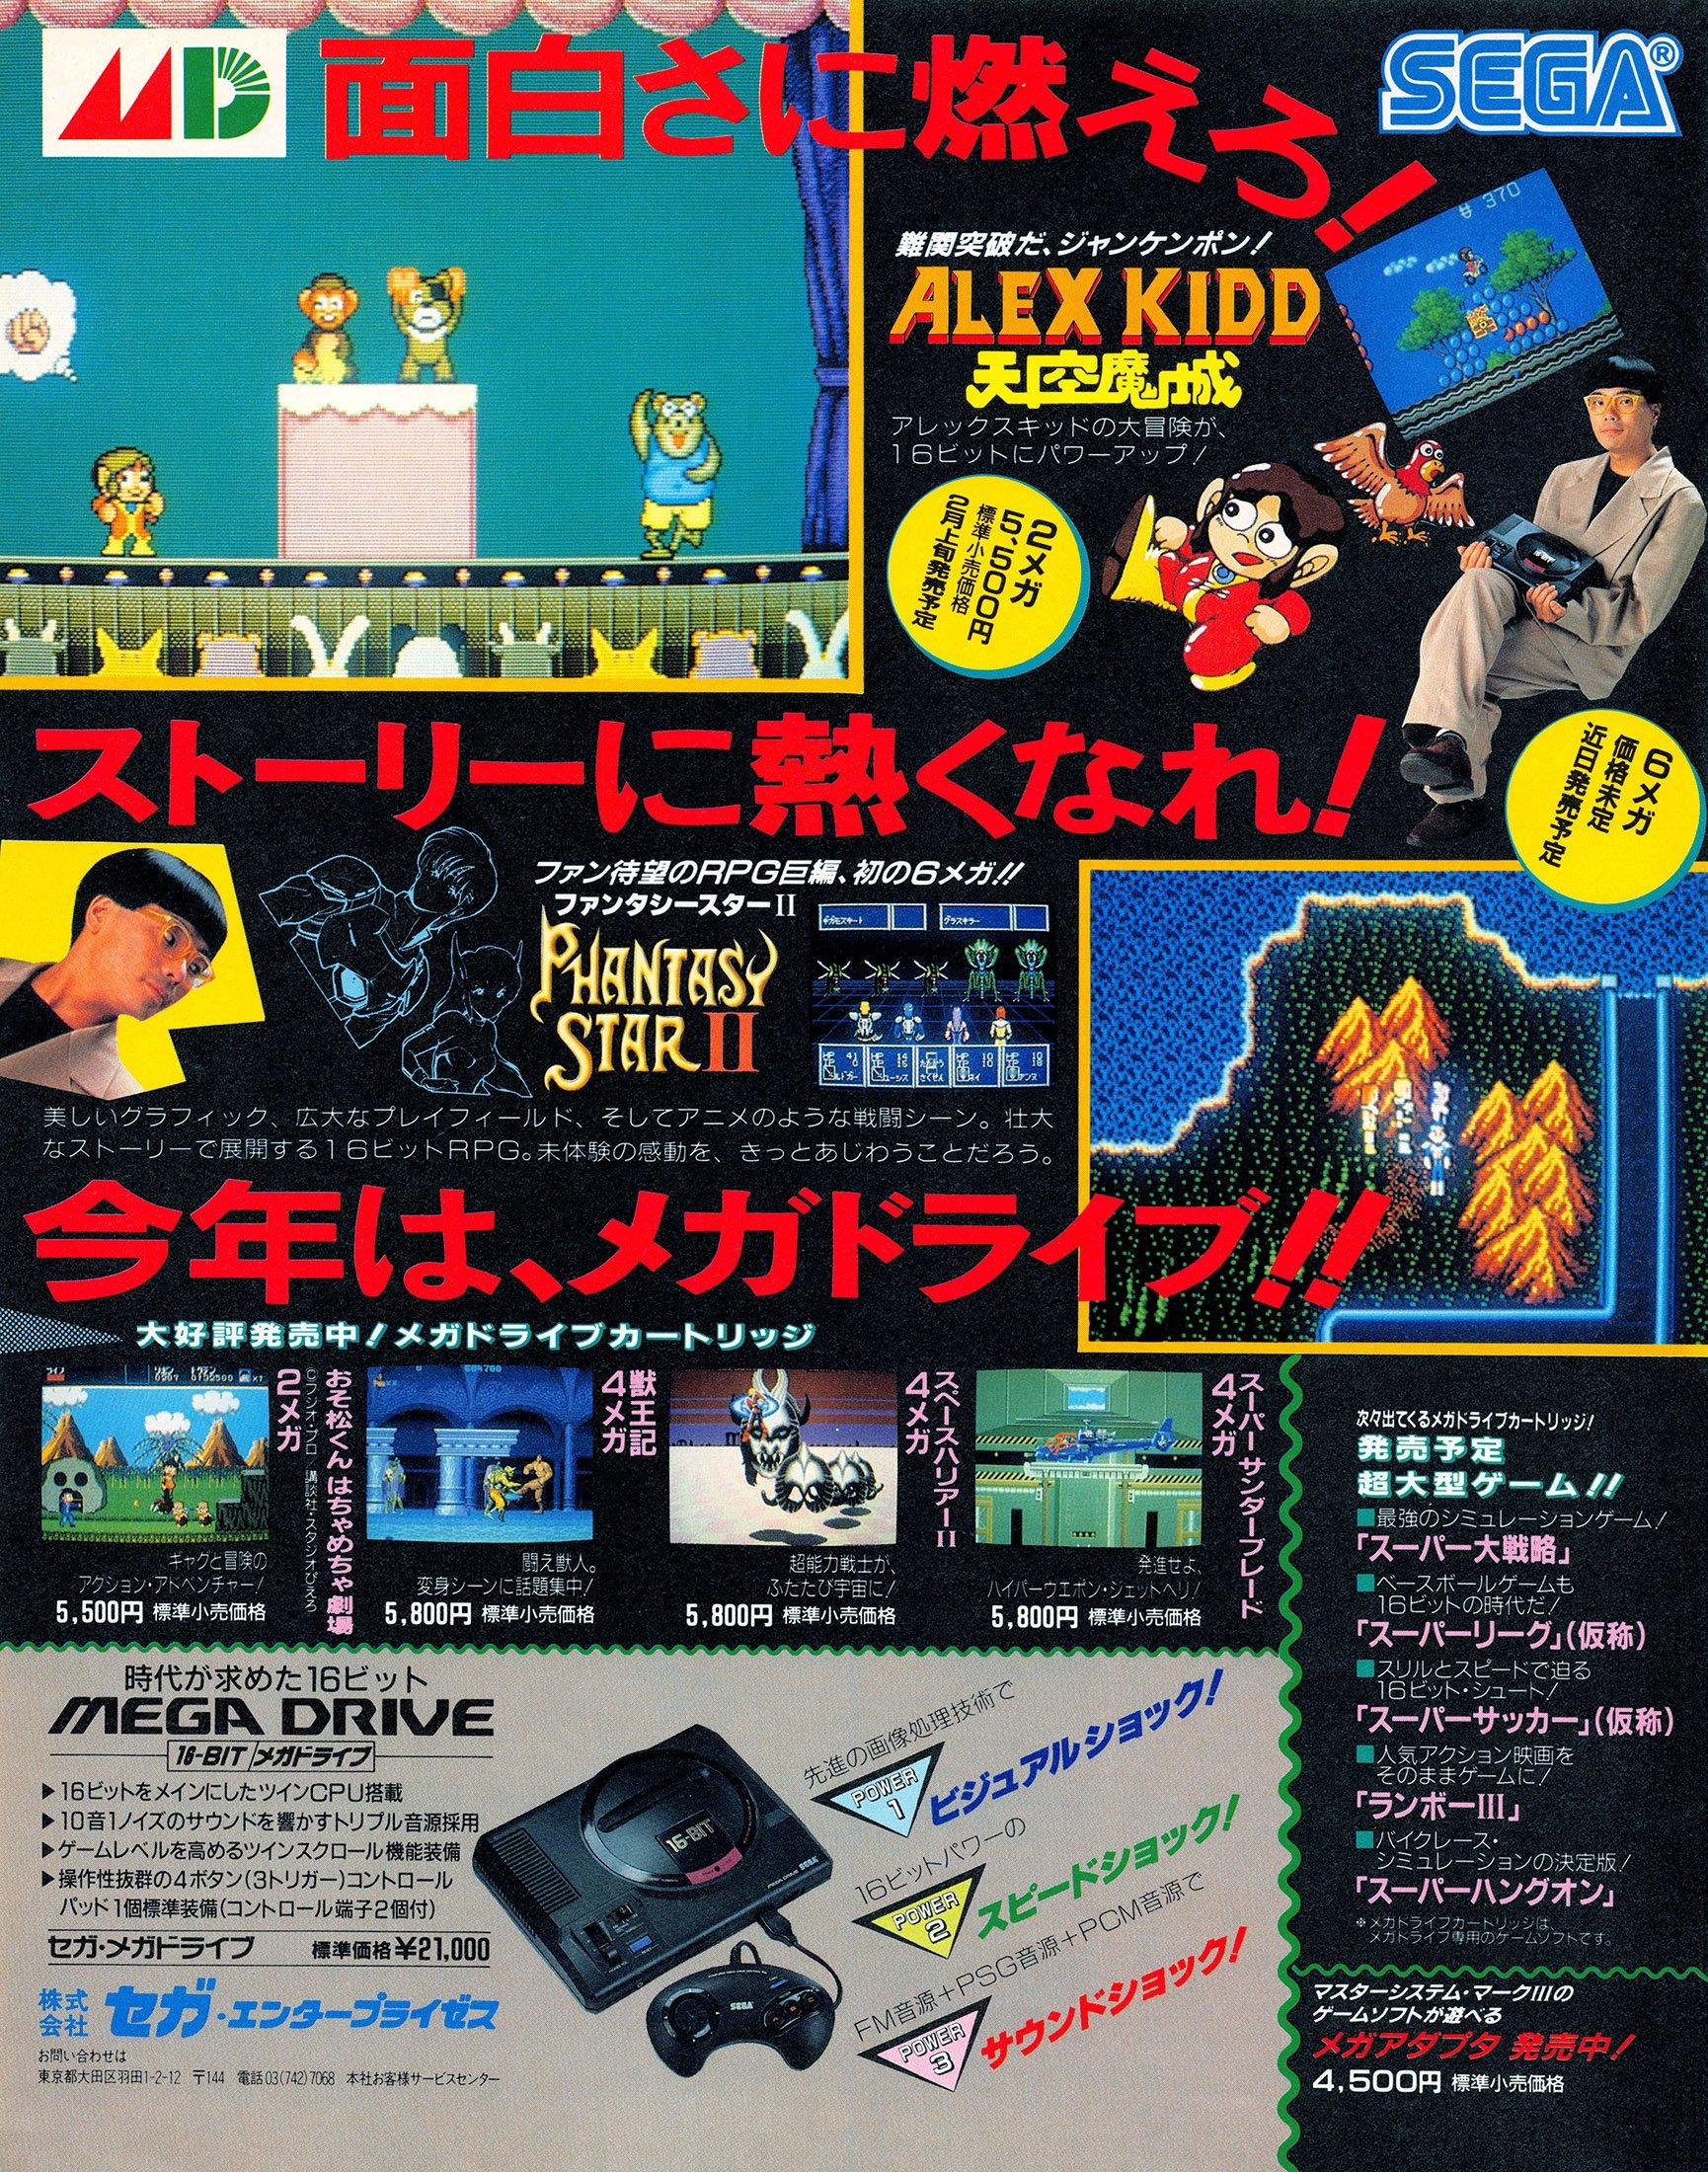 Alex Kidd in the Enchanted Castle, Phantasy Star II (Japan)